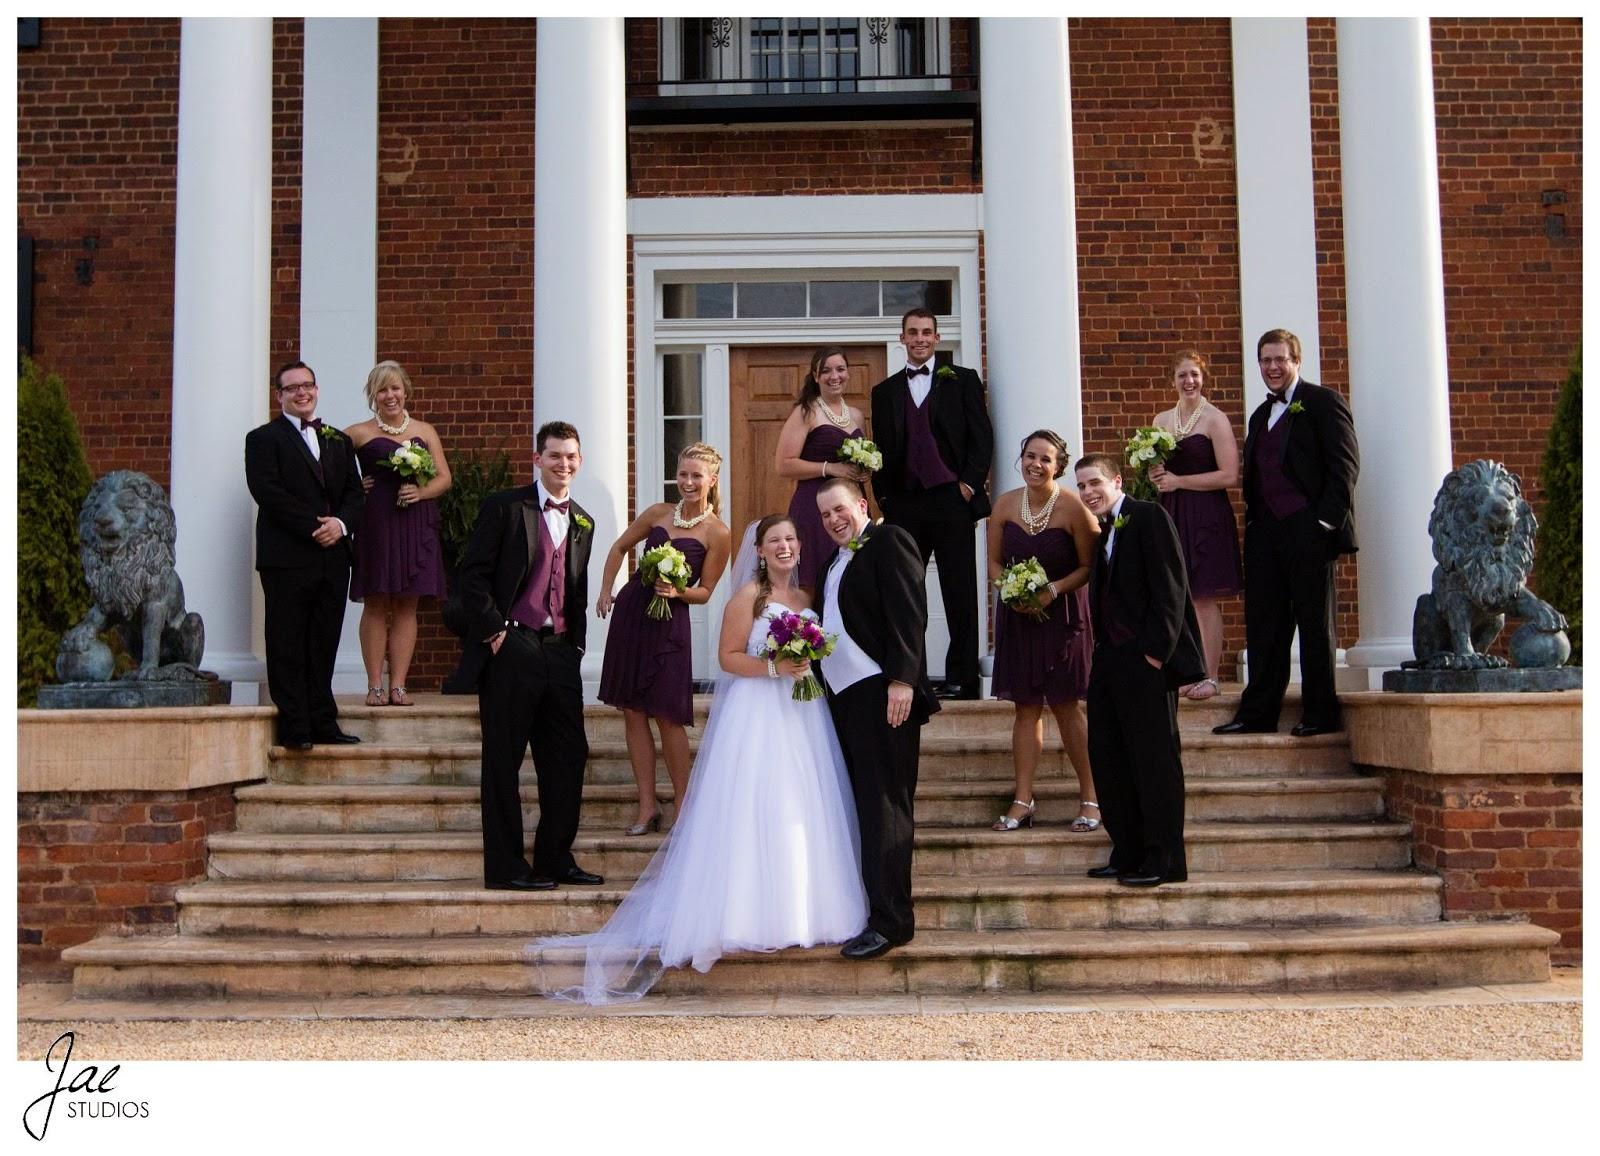 Jonathan and Julie, Bird cage, West Manor Estate, Wedding, Lynchburg, Virginia, Jae Studios, steps, wedding dress, bouquet, purple, tuxedo, dresses, bridesmaids, groomsmen, lions